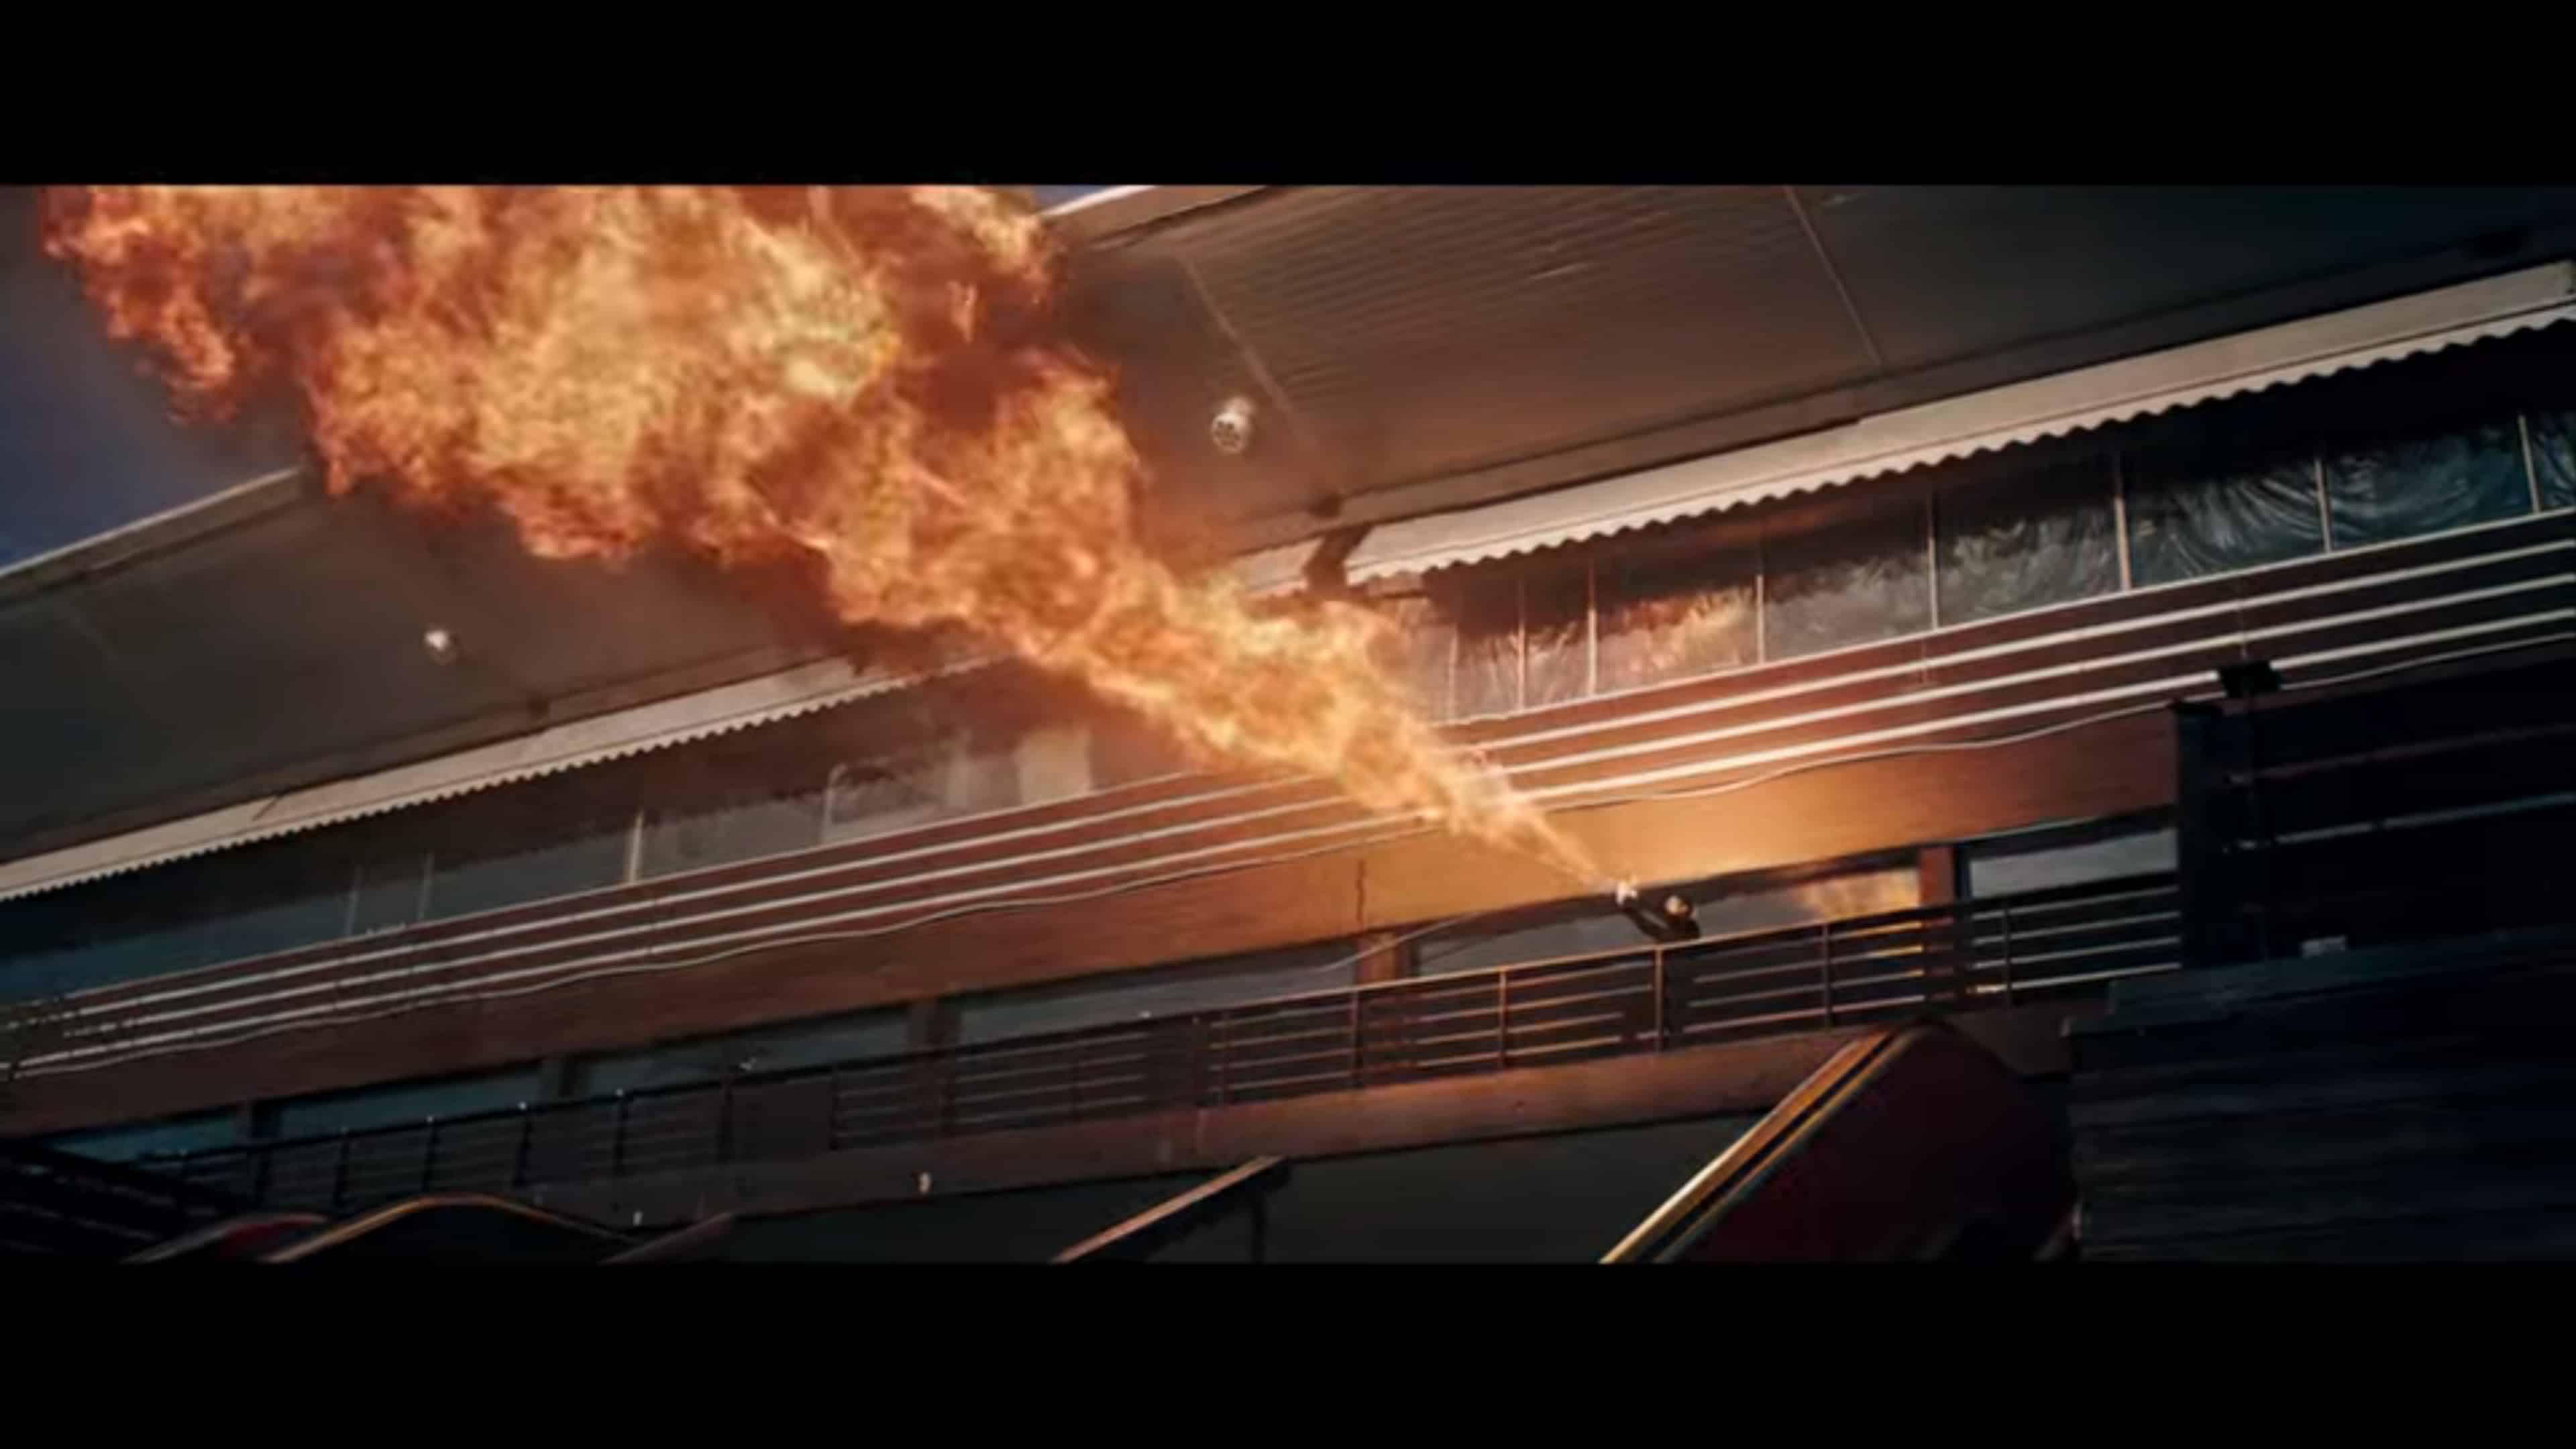 Naja using fire powers